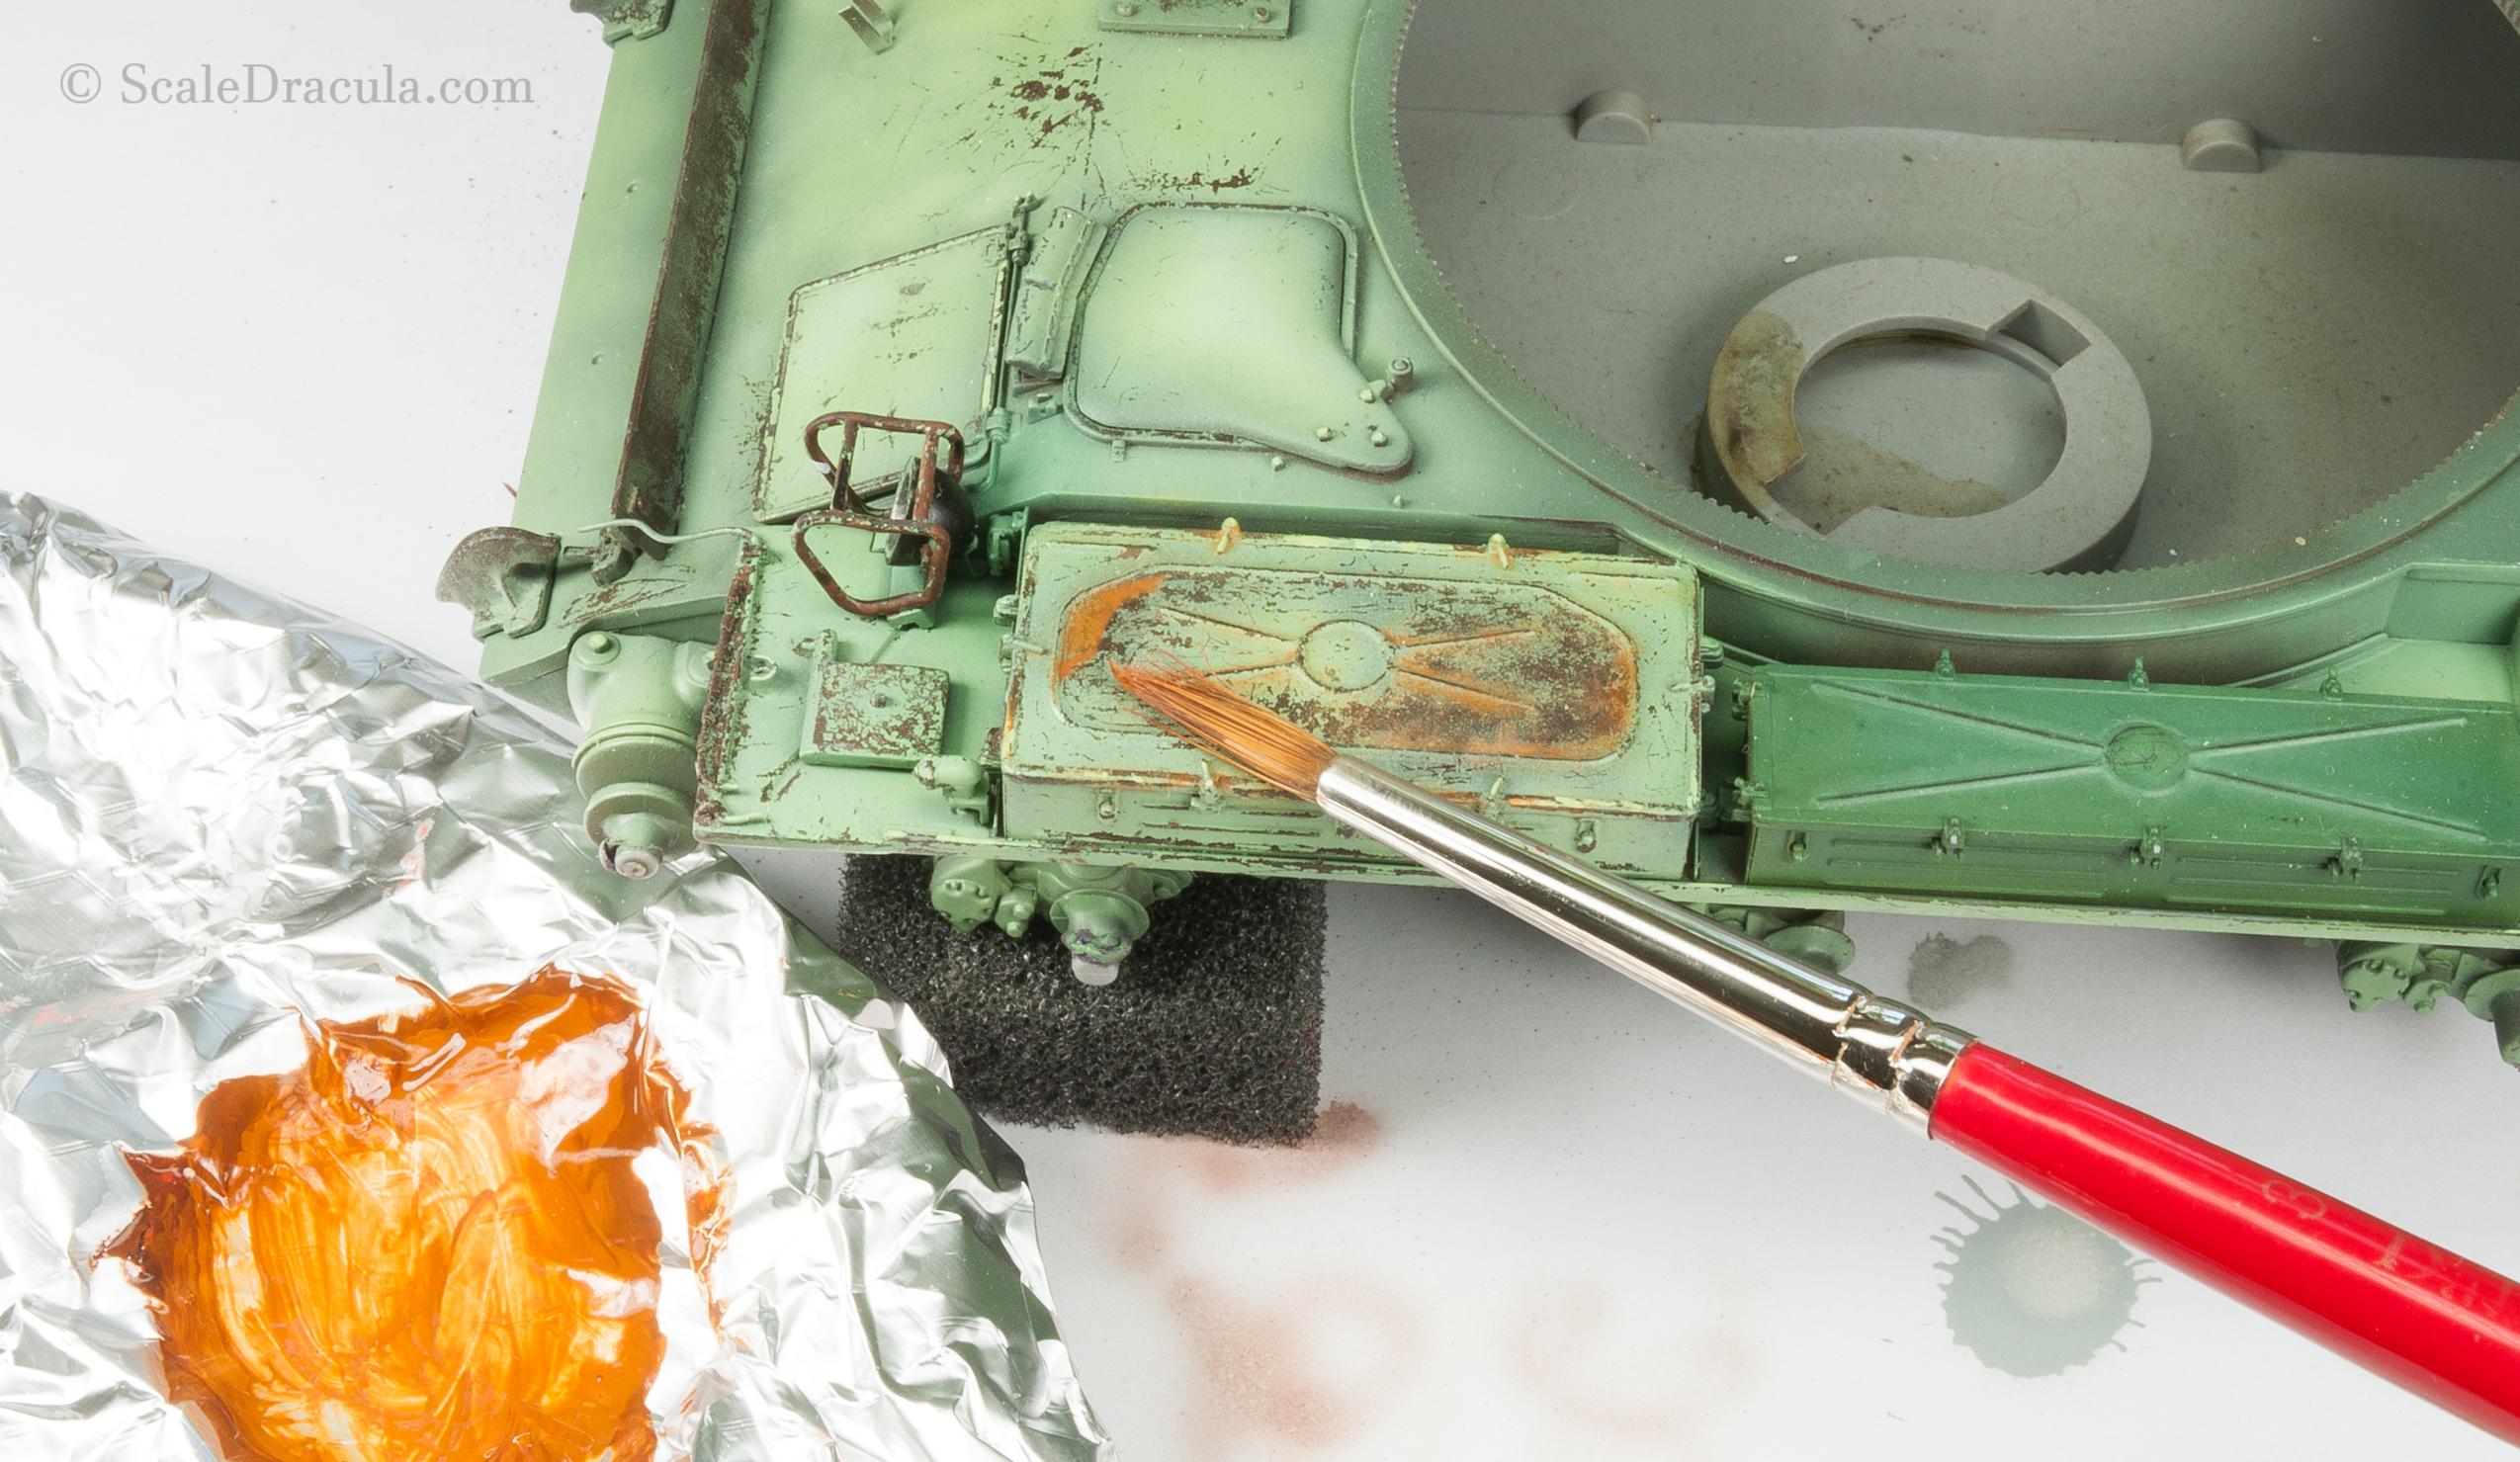 Rust on the main hull, ZSU-57 by TAKOM